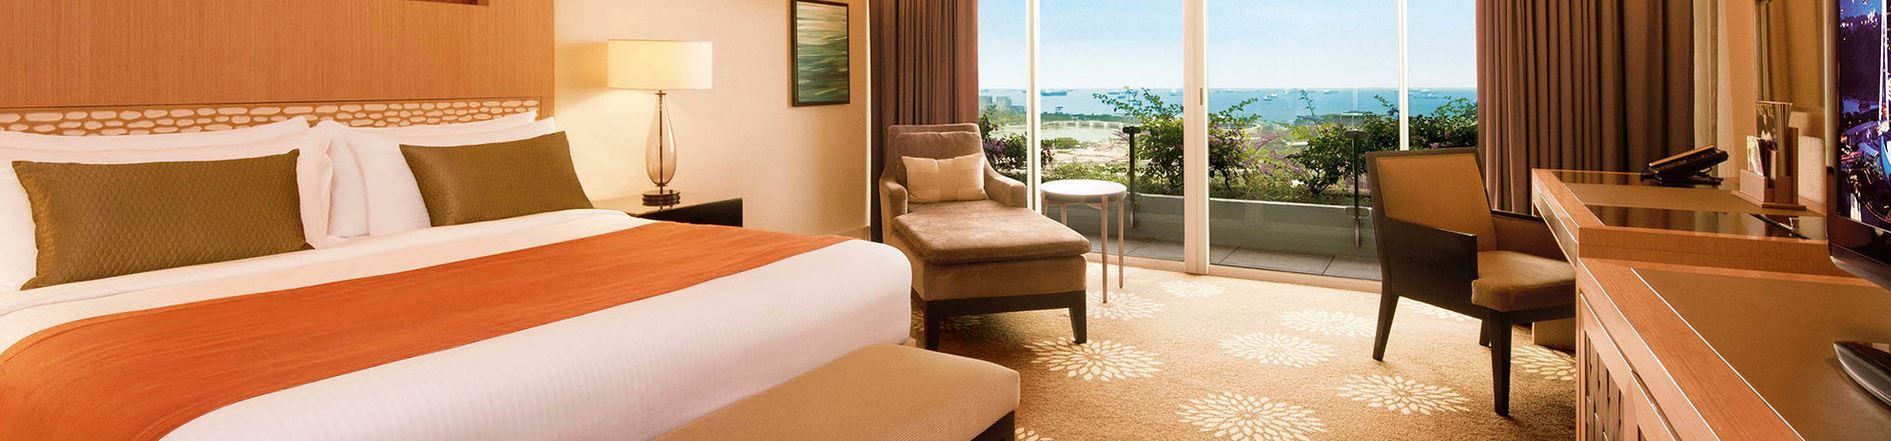 Premier_Relax_Room